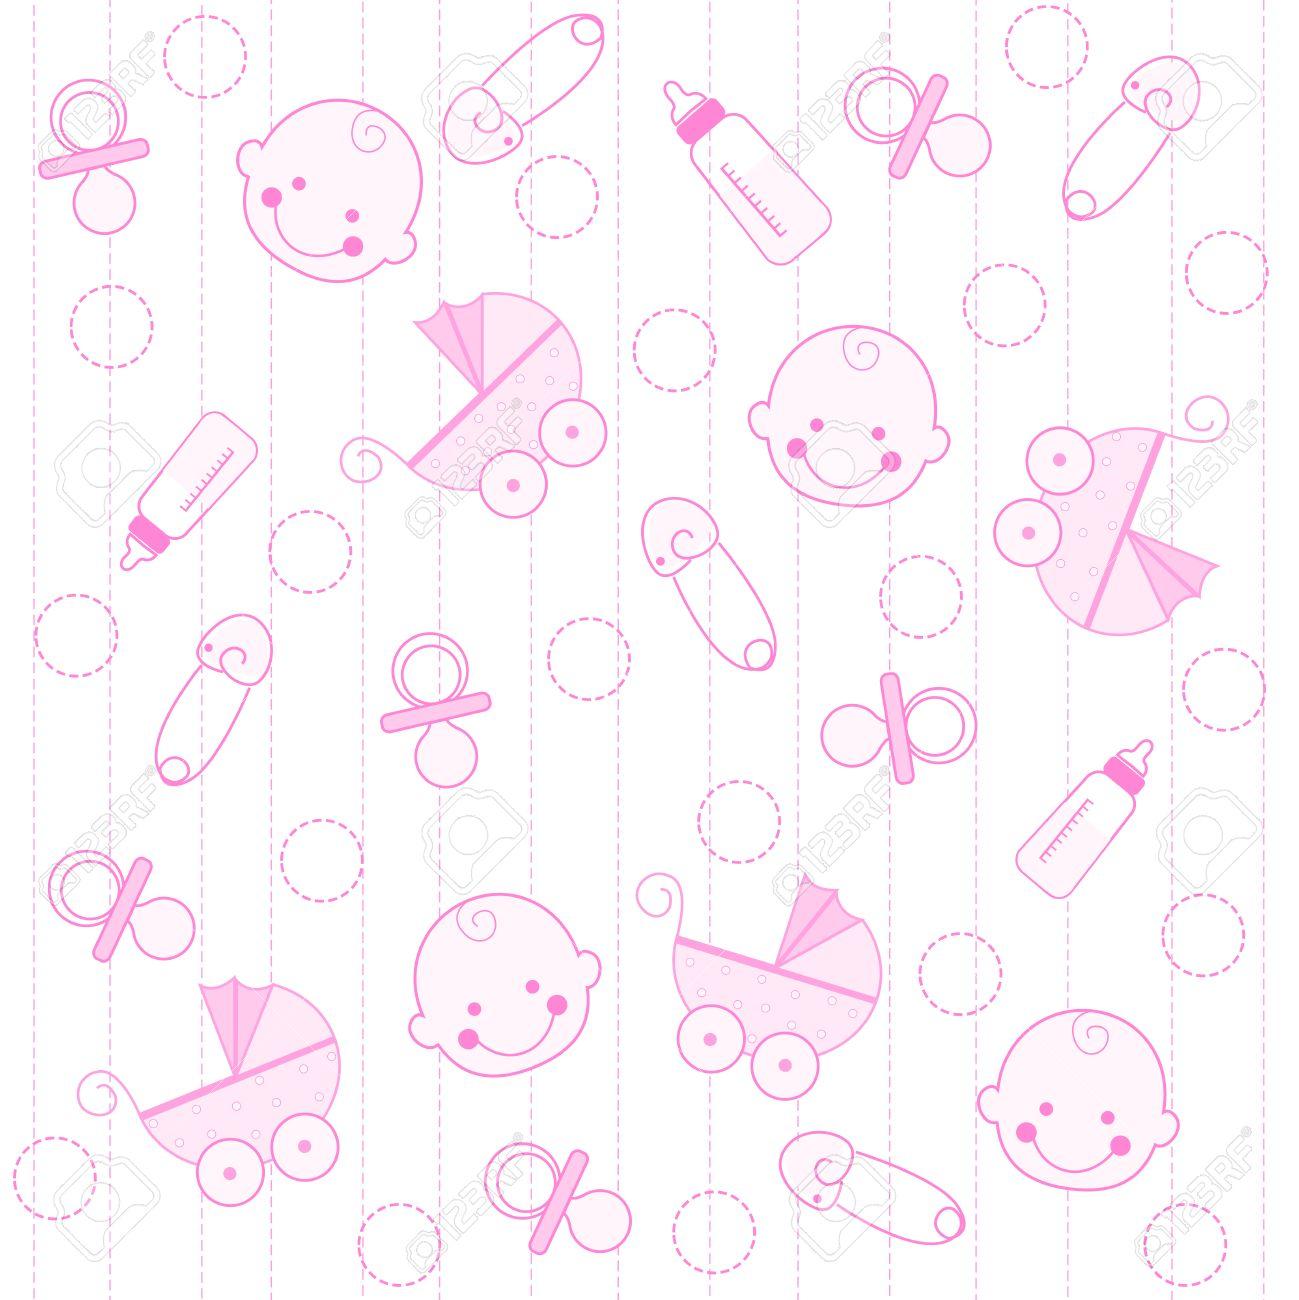 sweet pink baby girl elements seamless pattern / wallpaper royalty